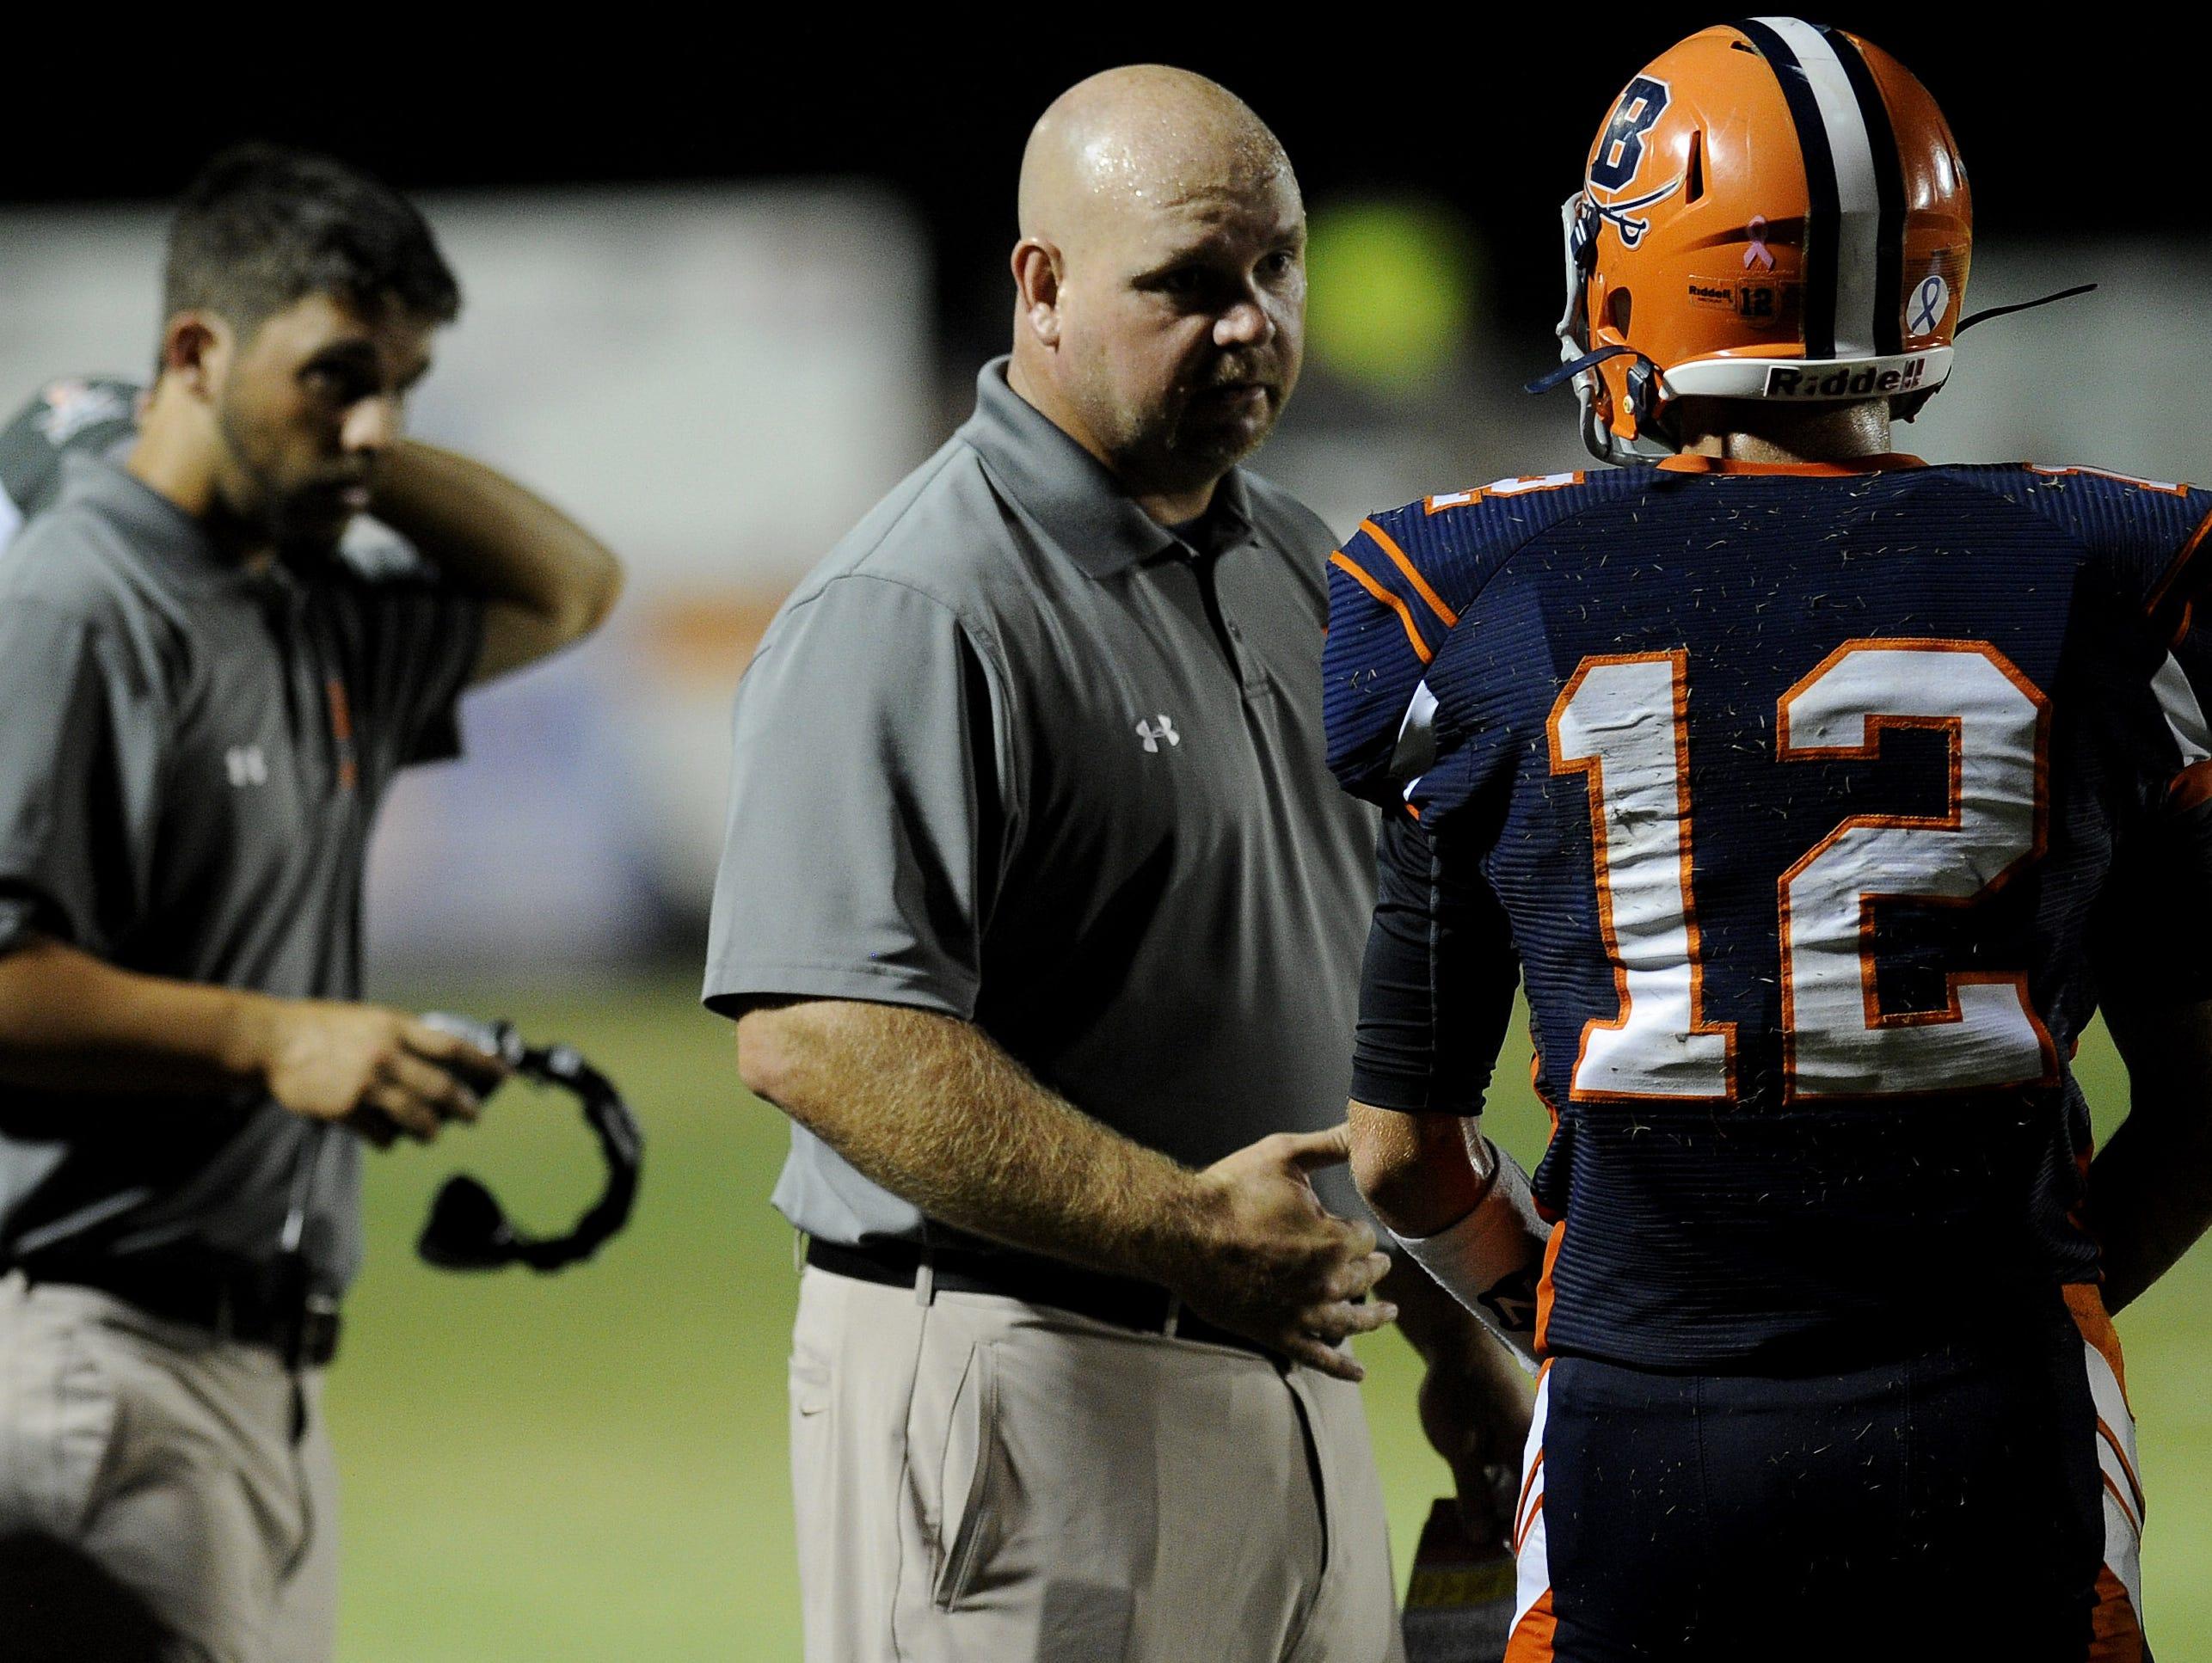 Beech coach Anthony Crabtree